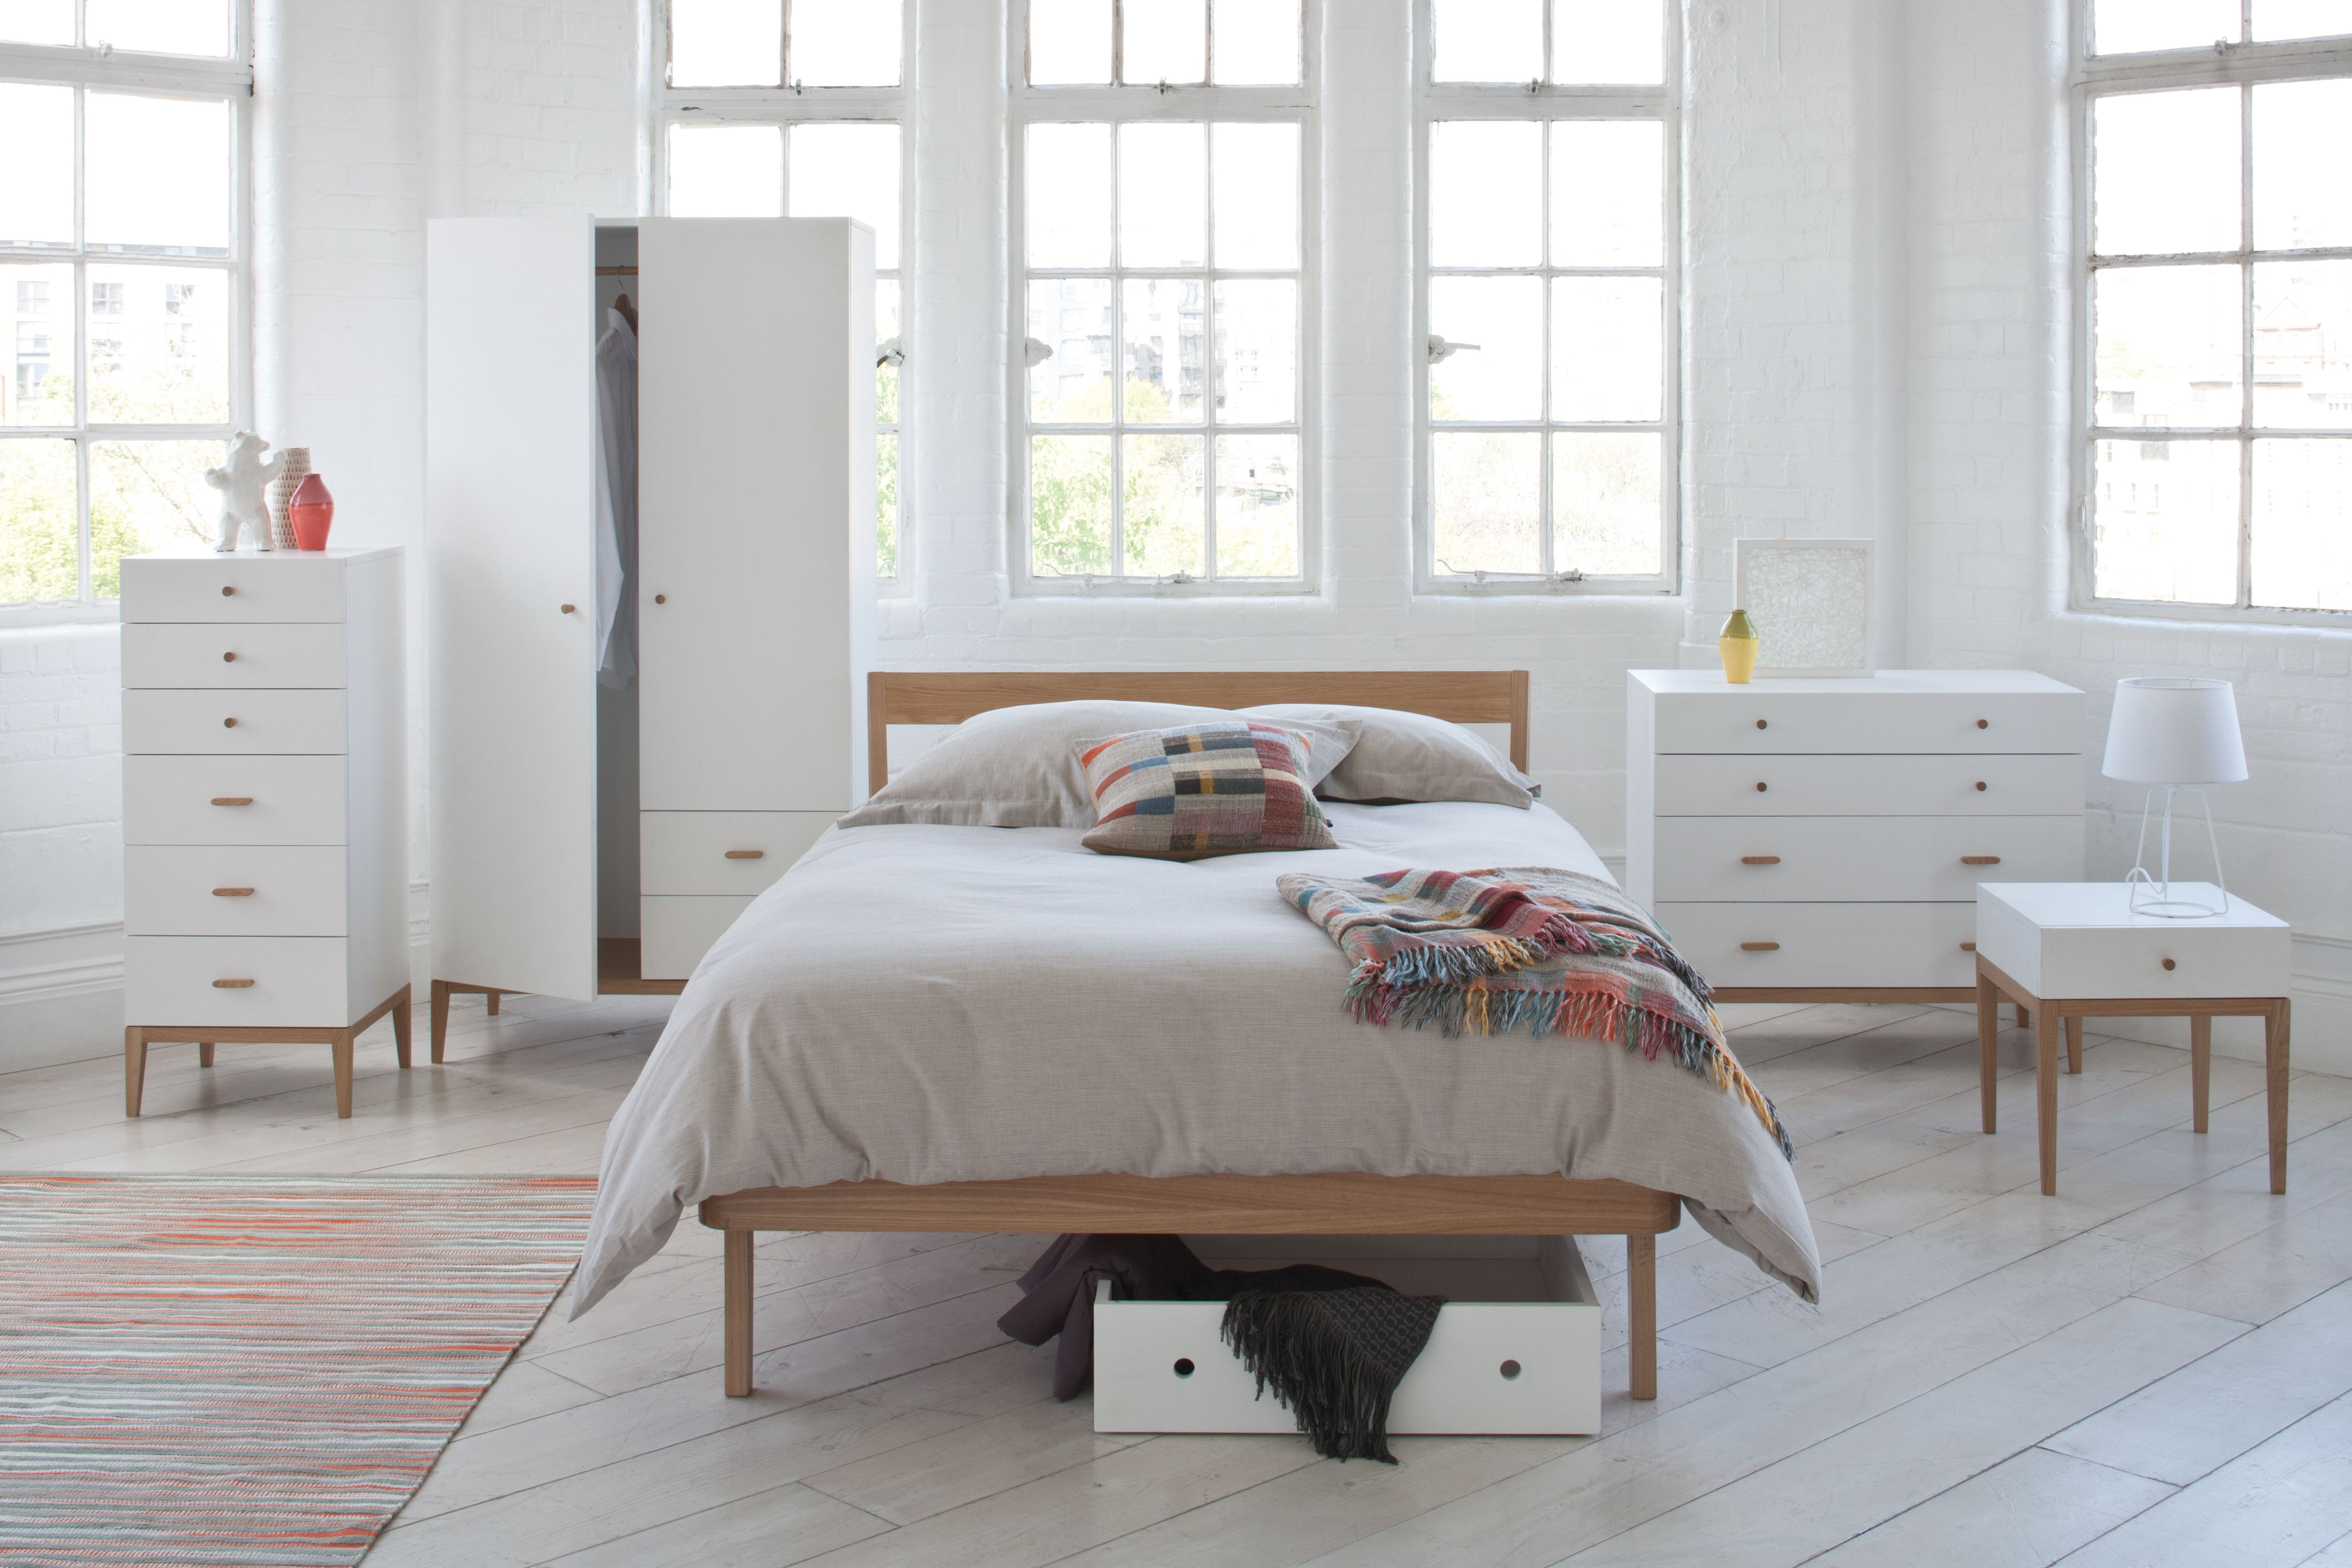 The Habitat Tatasuma Drawer Set will bring a Scandinavian